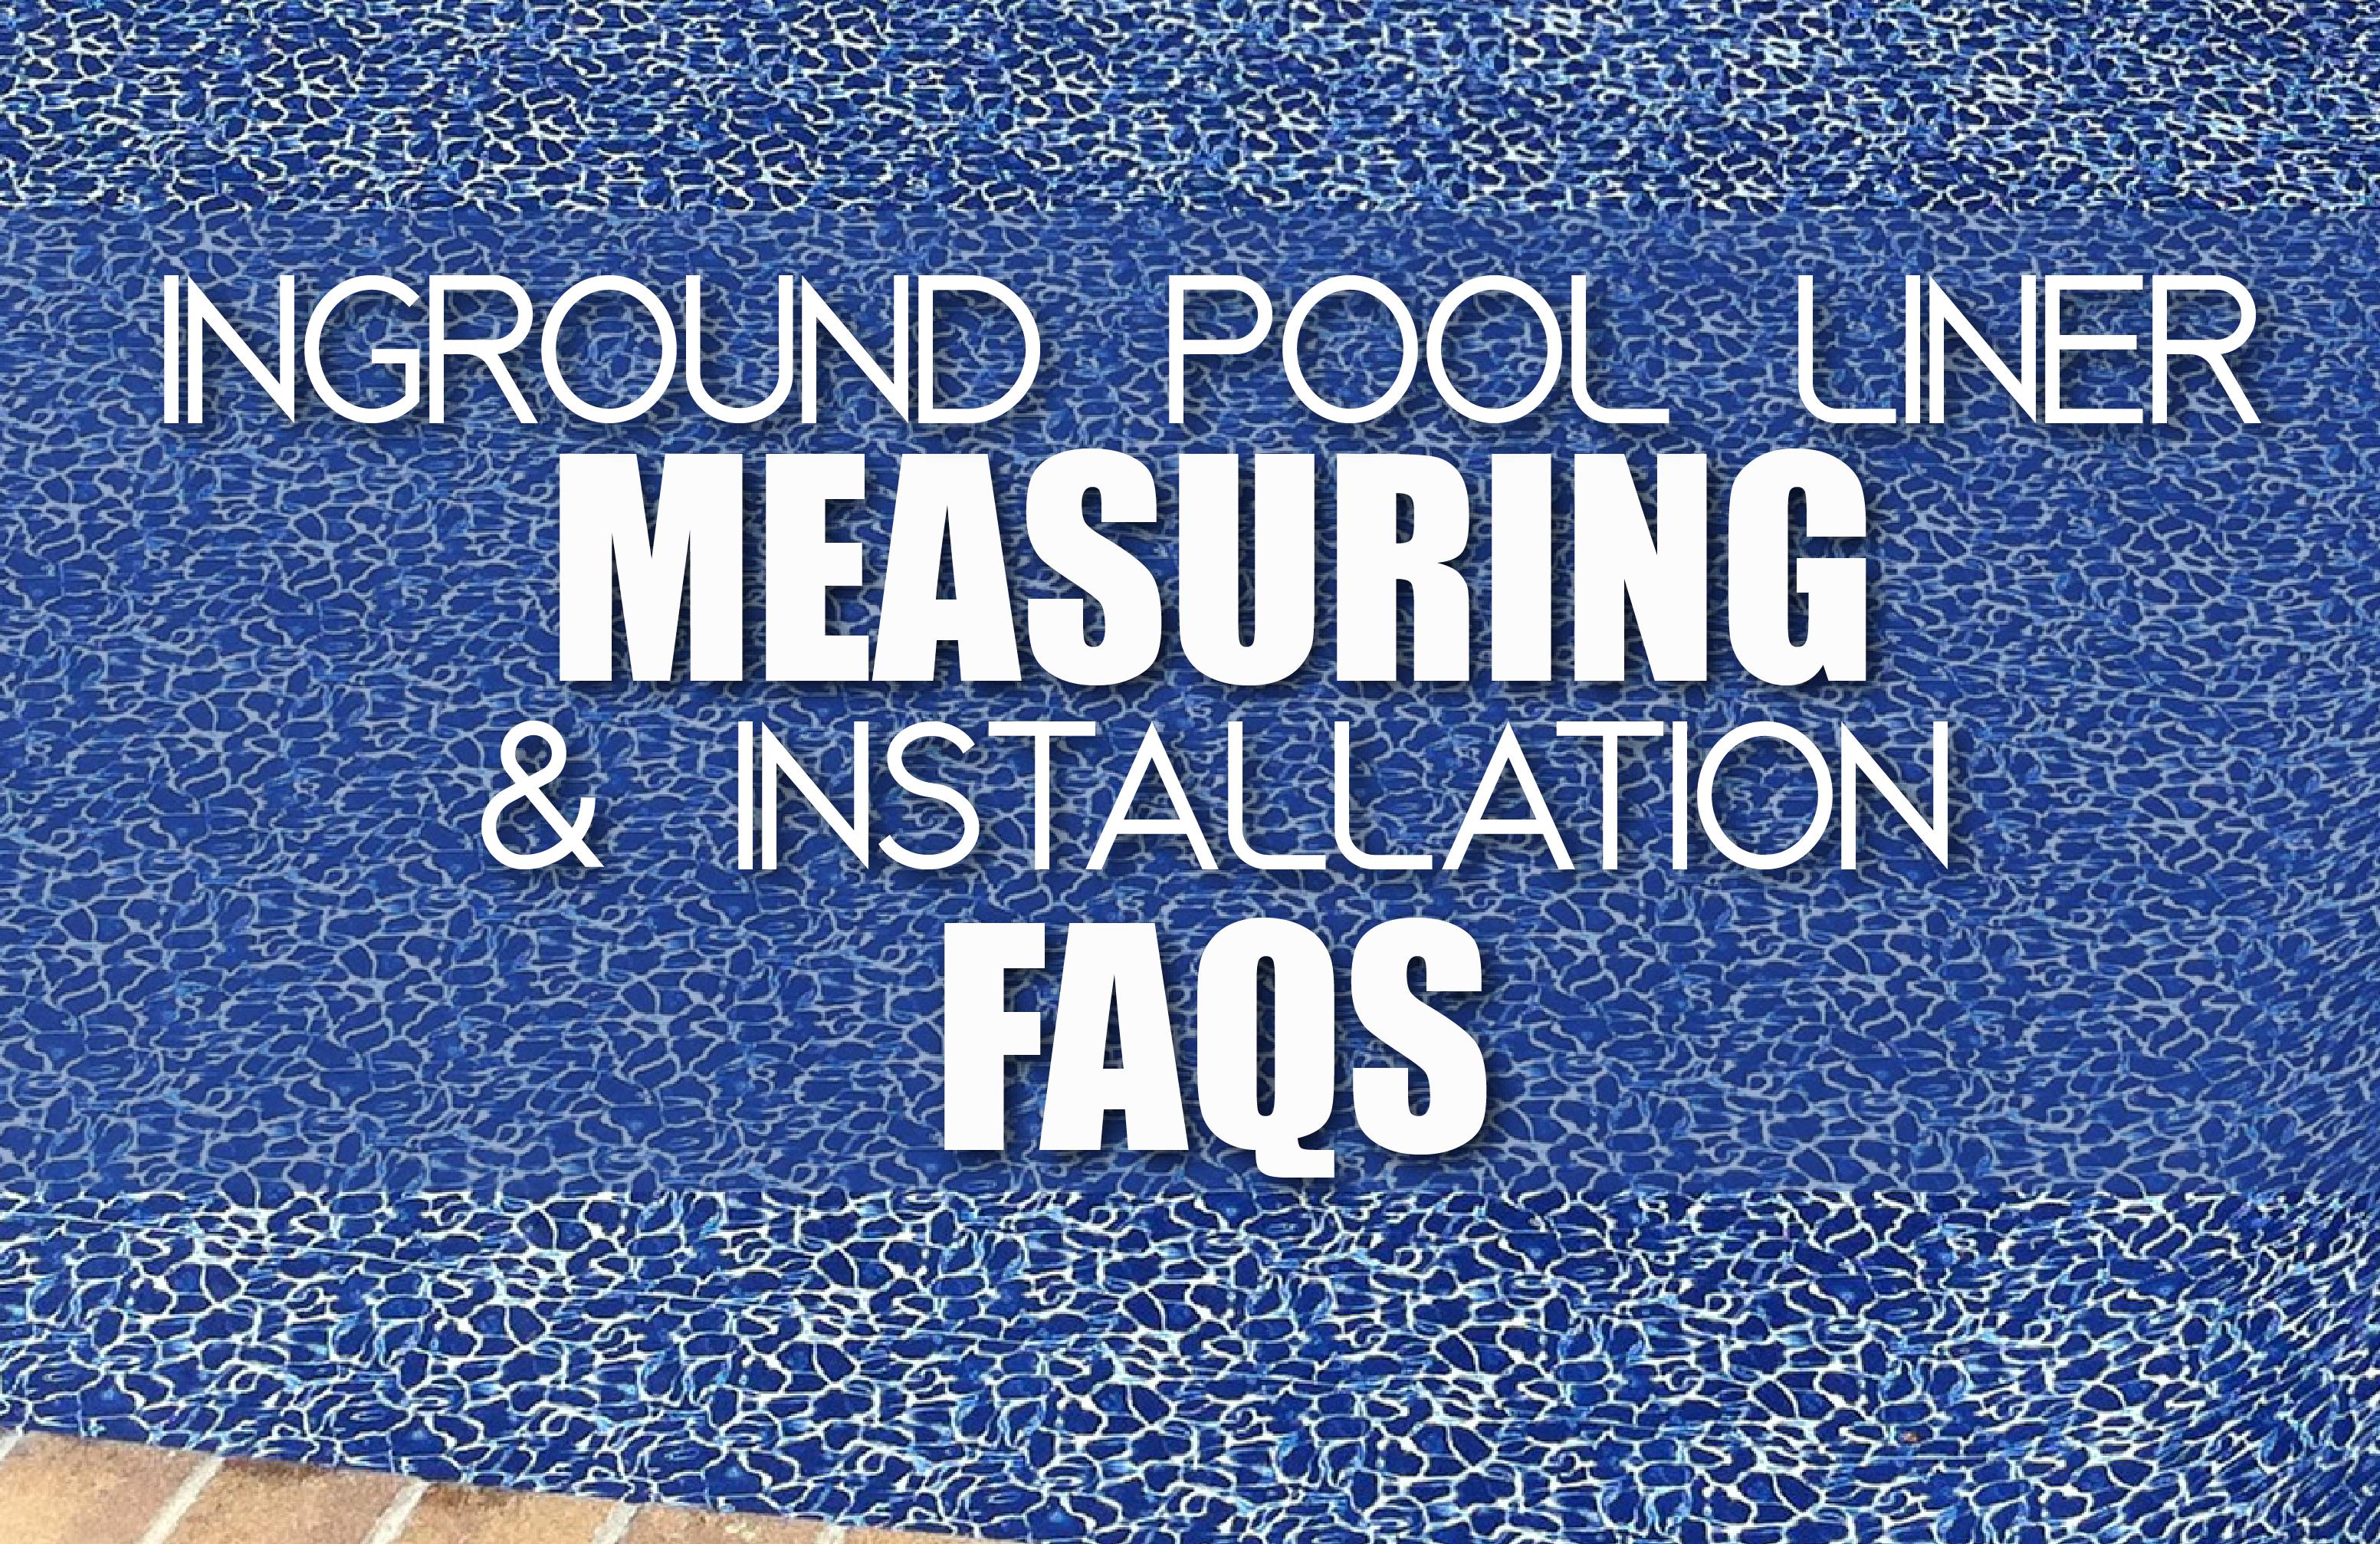 Inground Swimming Pool Liner Measuring And Installation FAQ\'s